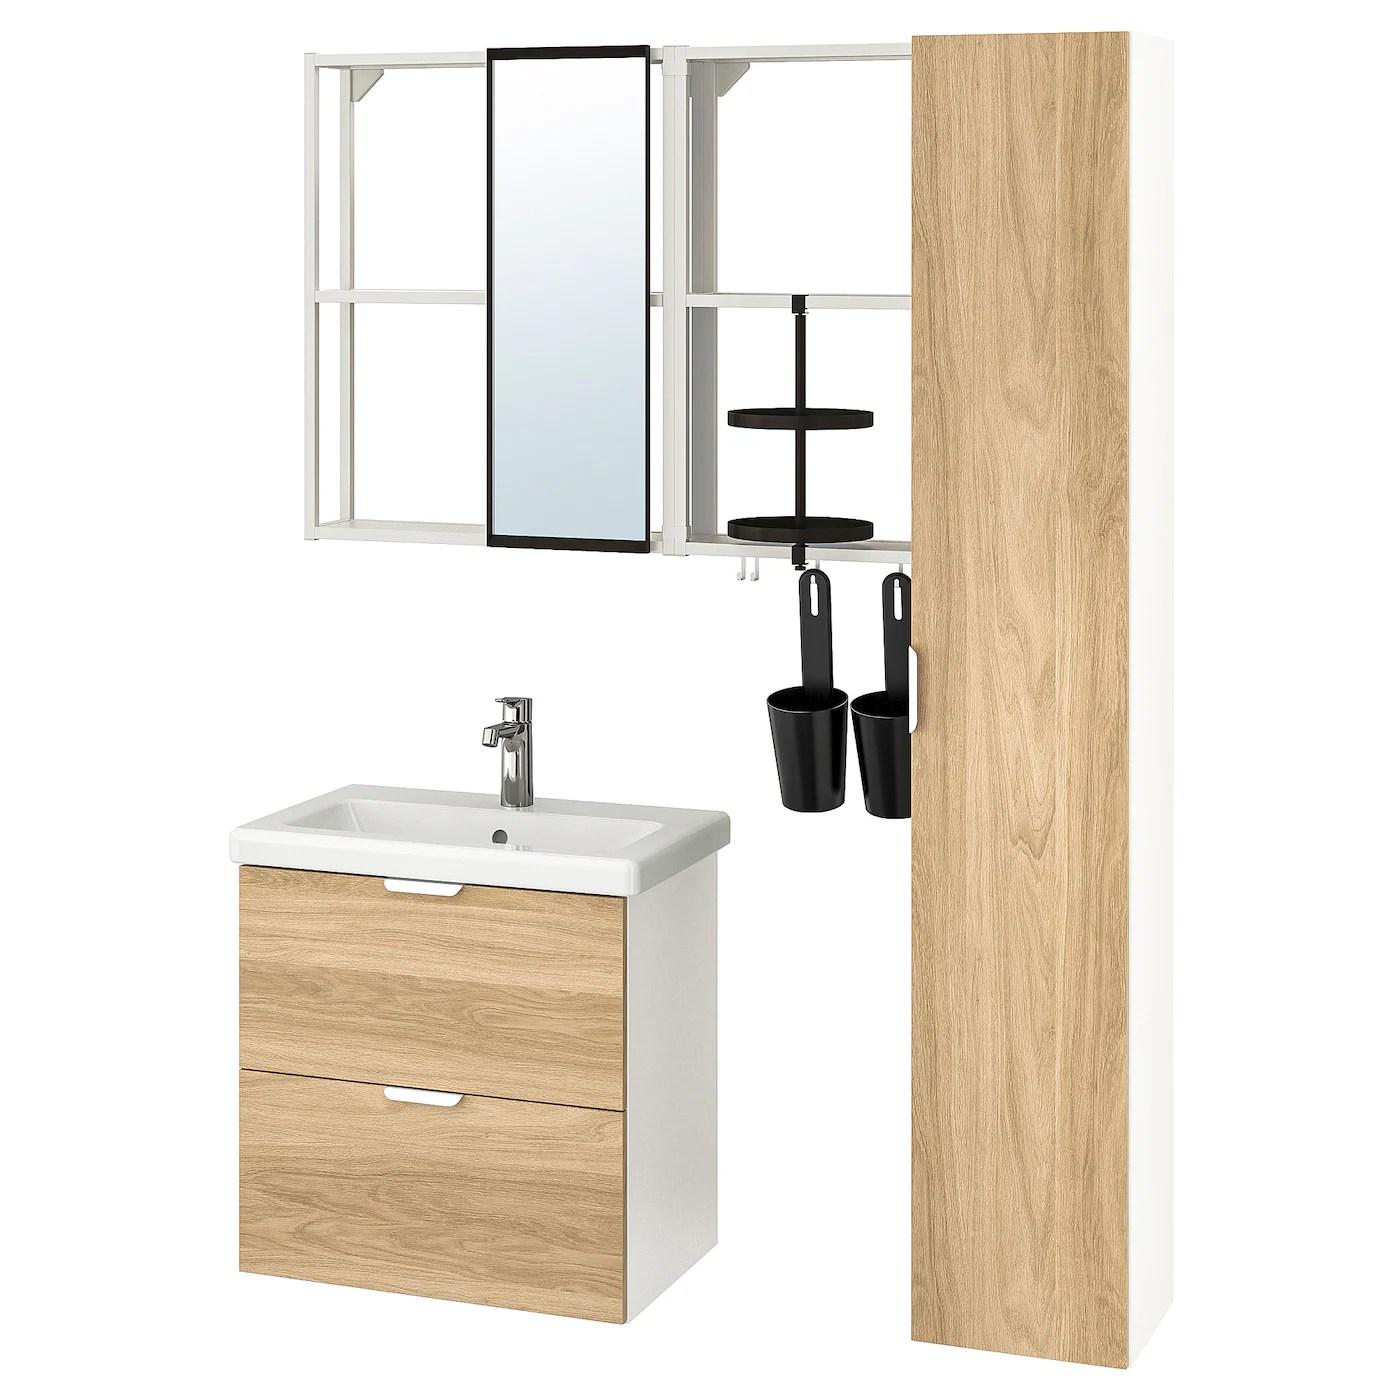 Enhet Tvallen Mobilier Salle De Bain 18 Pieces Motif Chene Blanc Mitigeur Lavabo Brogrund Ikea